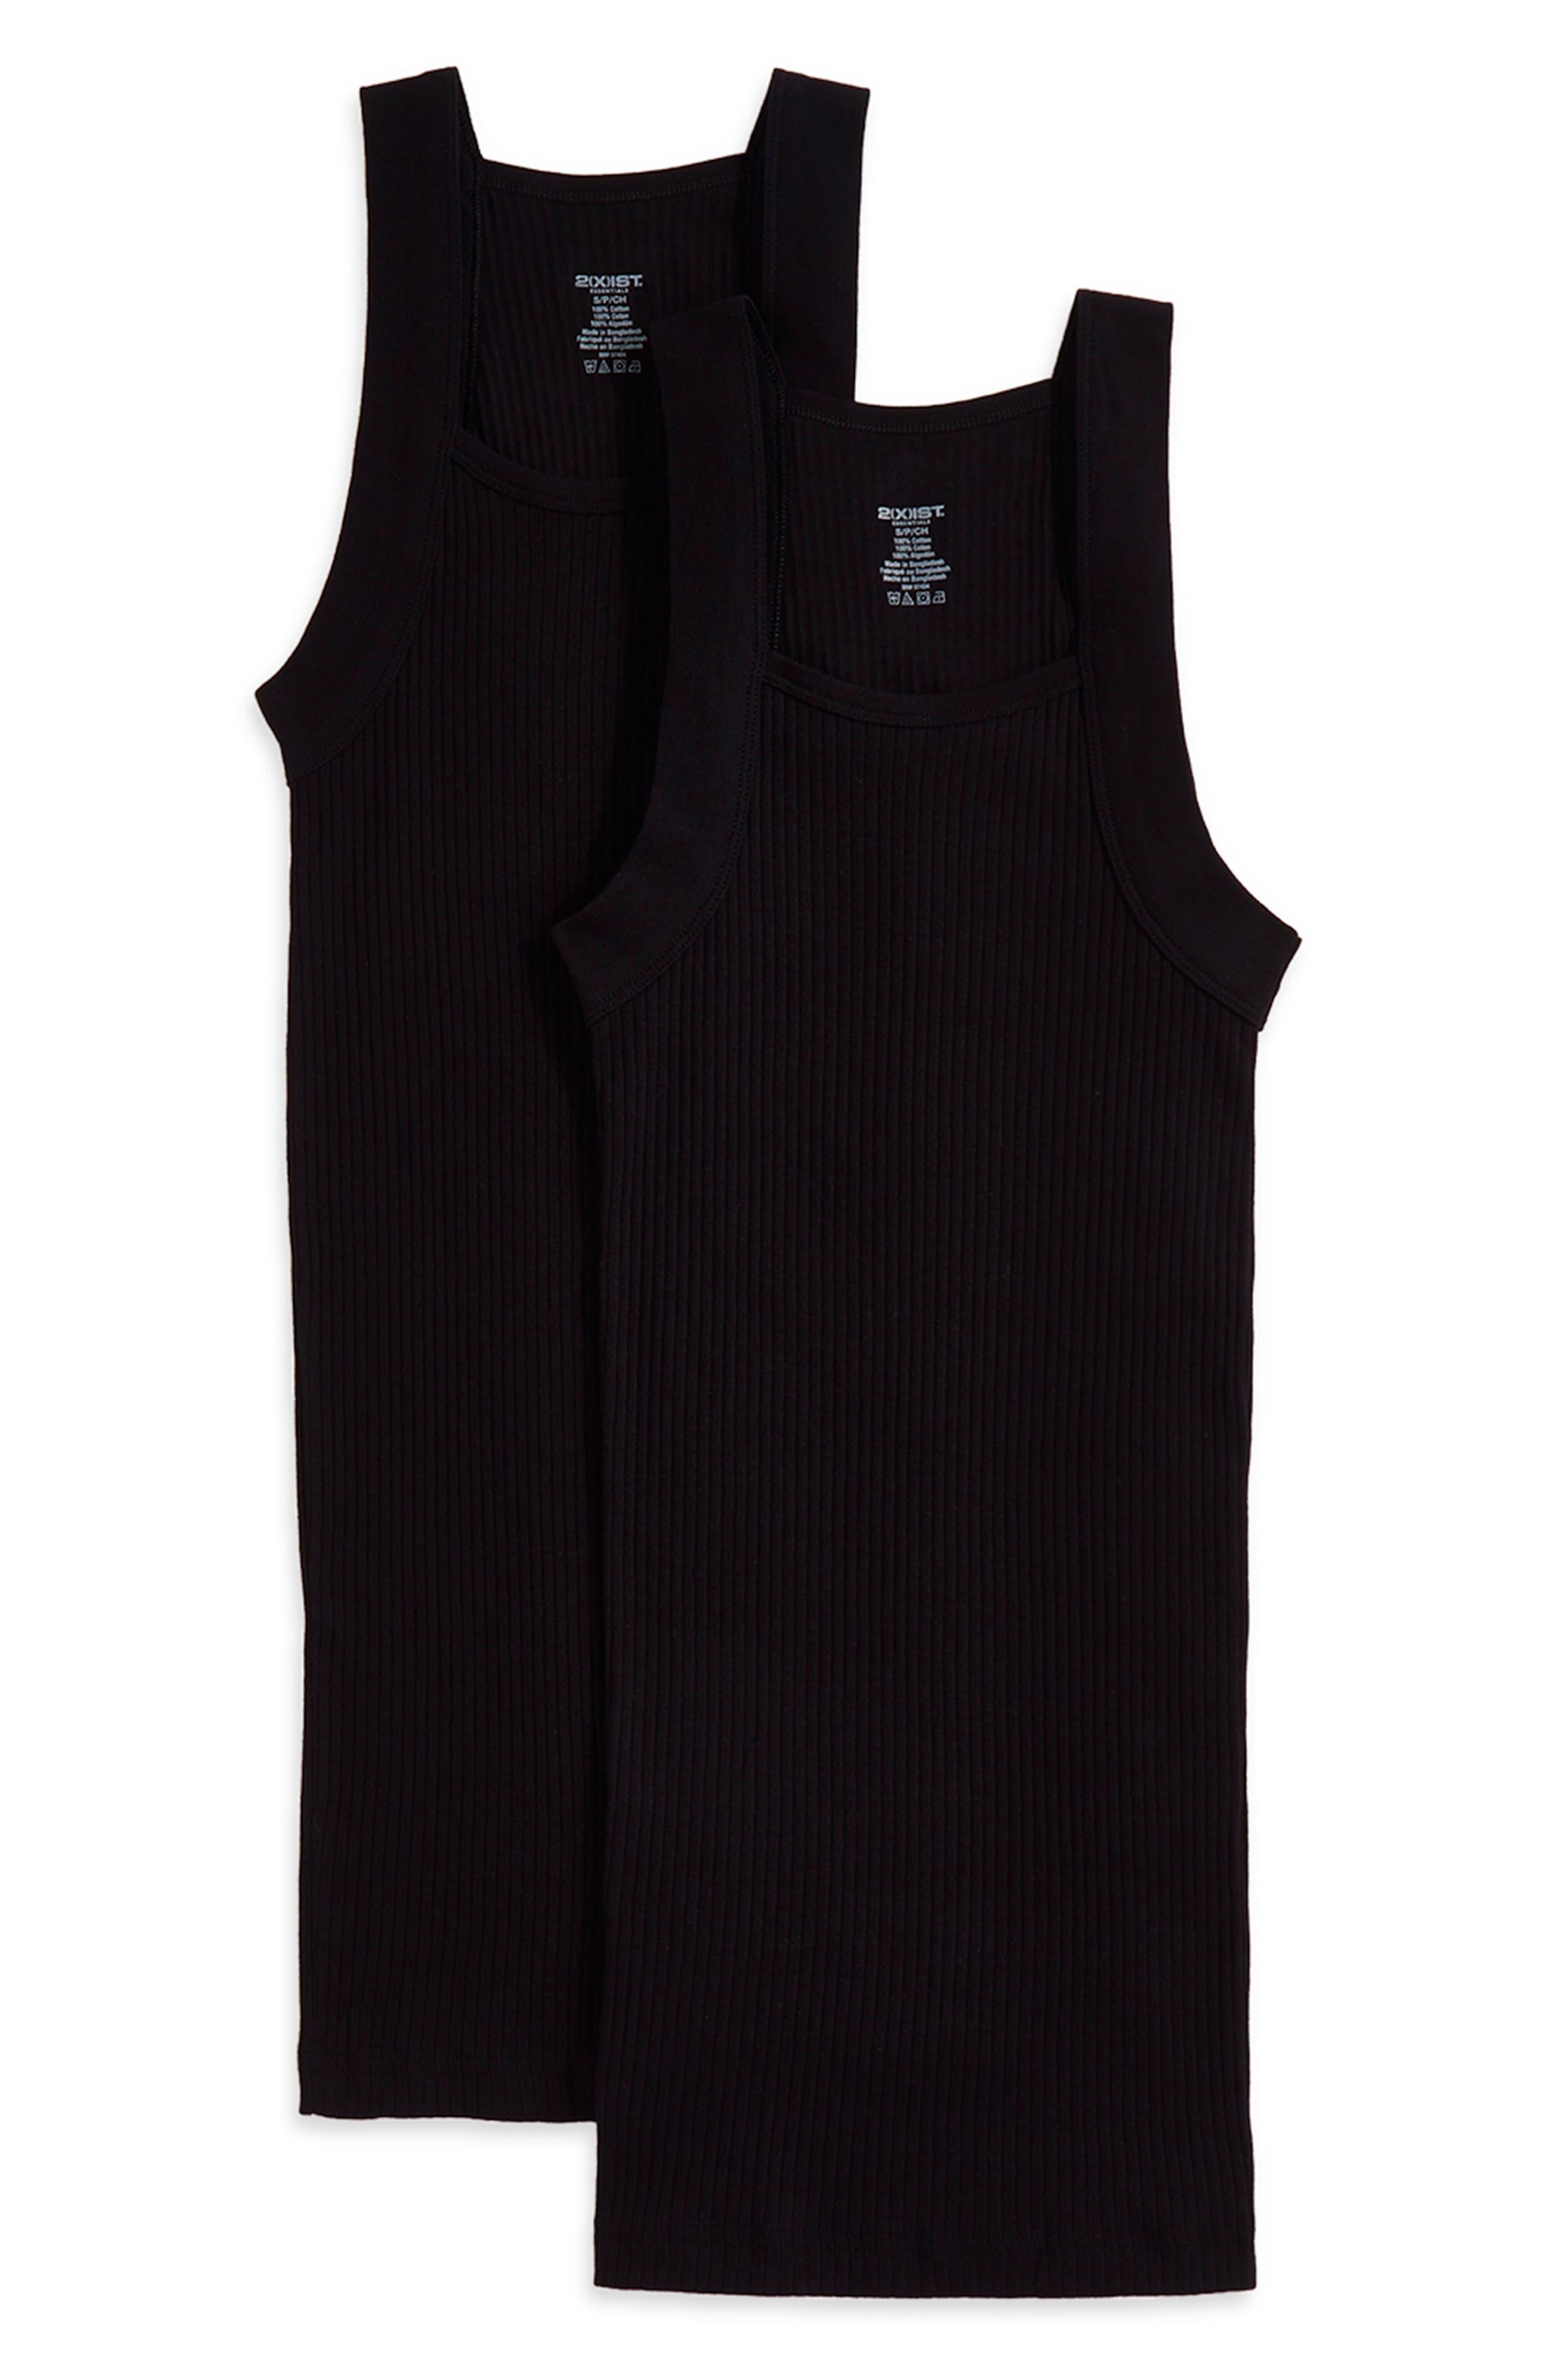 2-Pack Cotton Tank Top,                             Main thumbnail 1, color,                             BLACK NEW LOGO